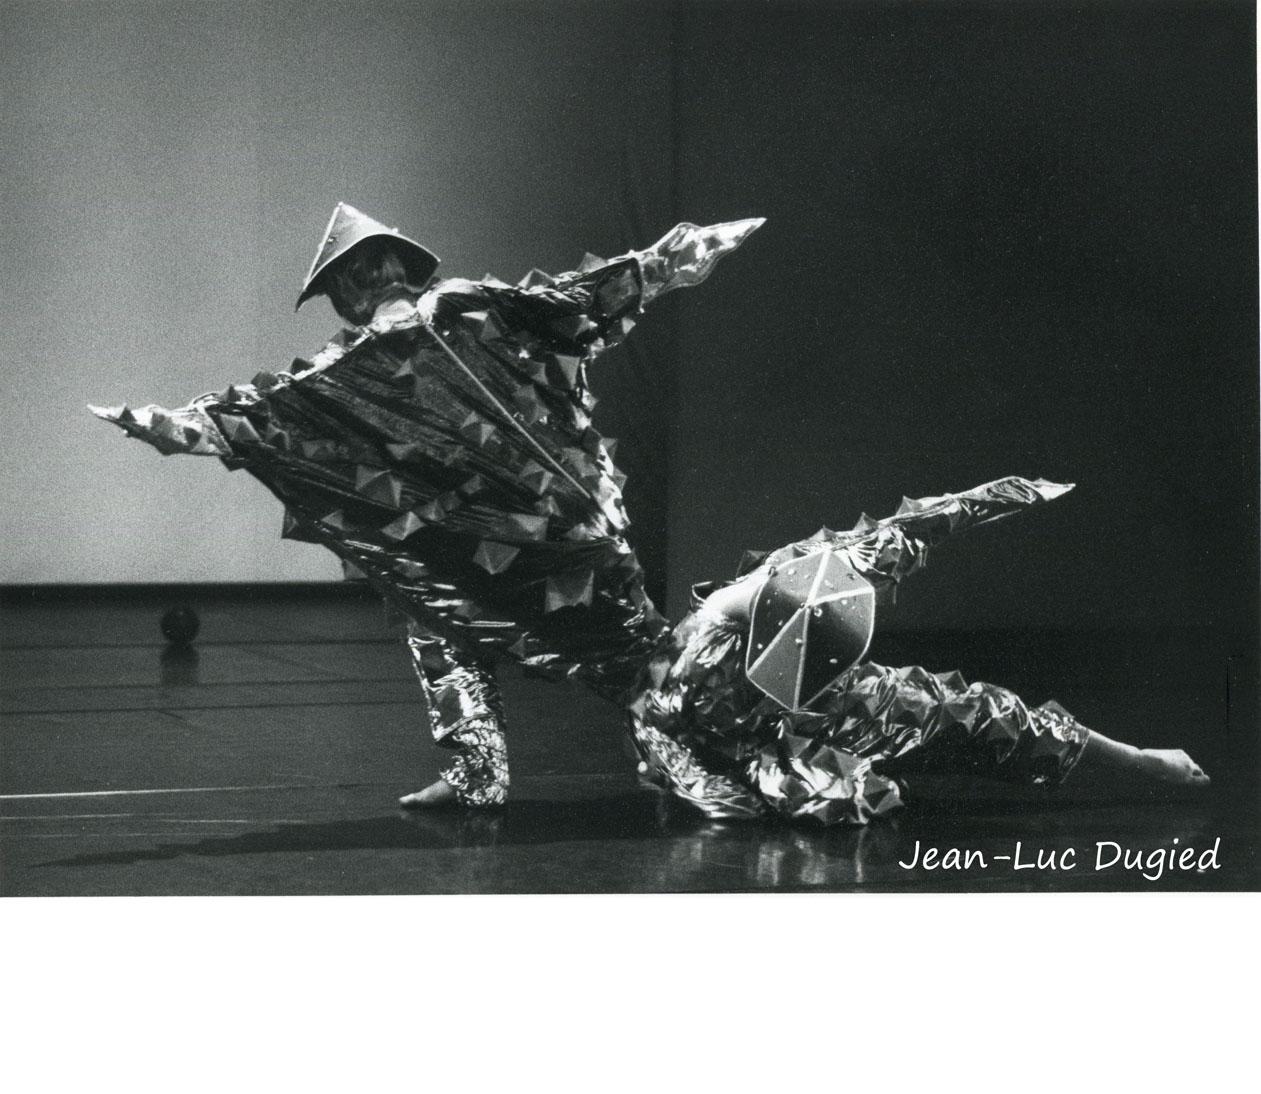 43 Witzman-Anaya Alejandro - 2010 personnages à danser - 1988